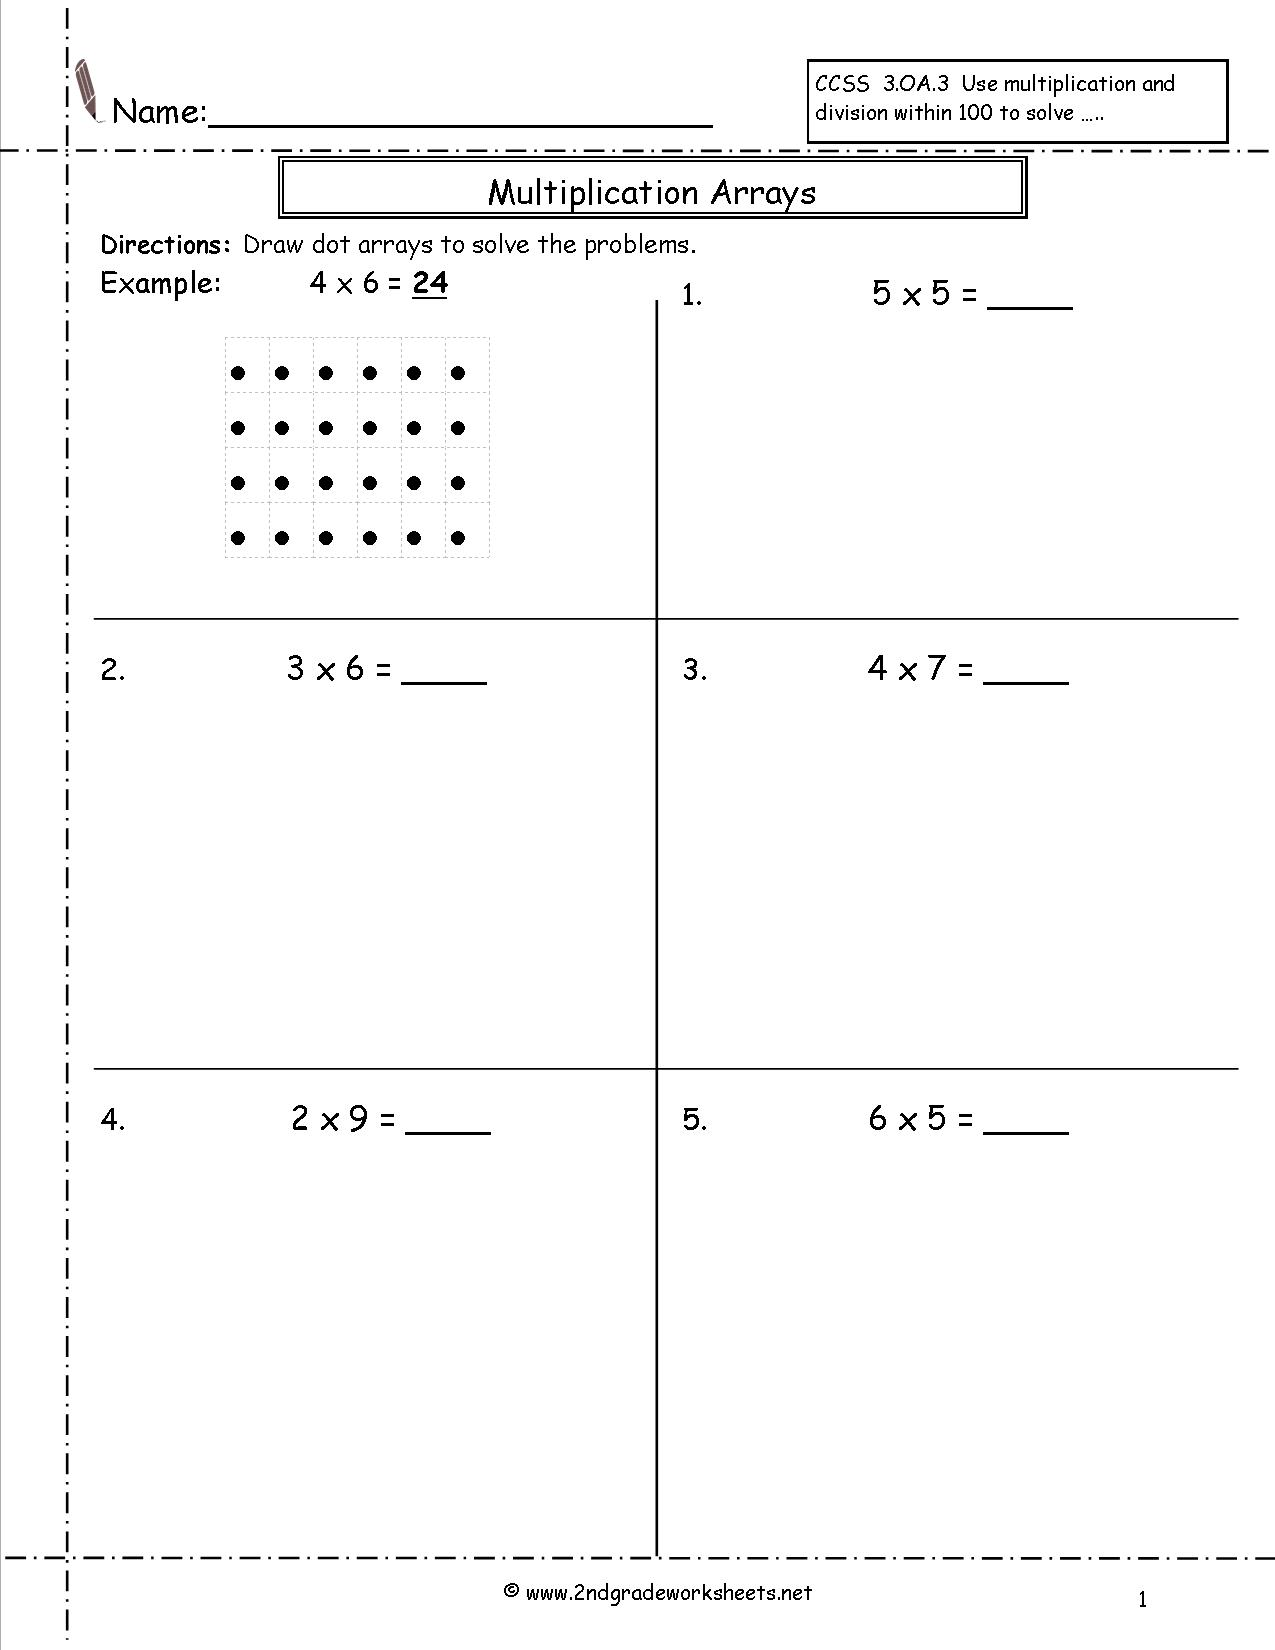 Multiplication Arrays Worksheets 4th Grade  356051